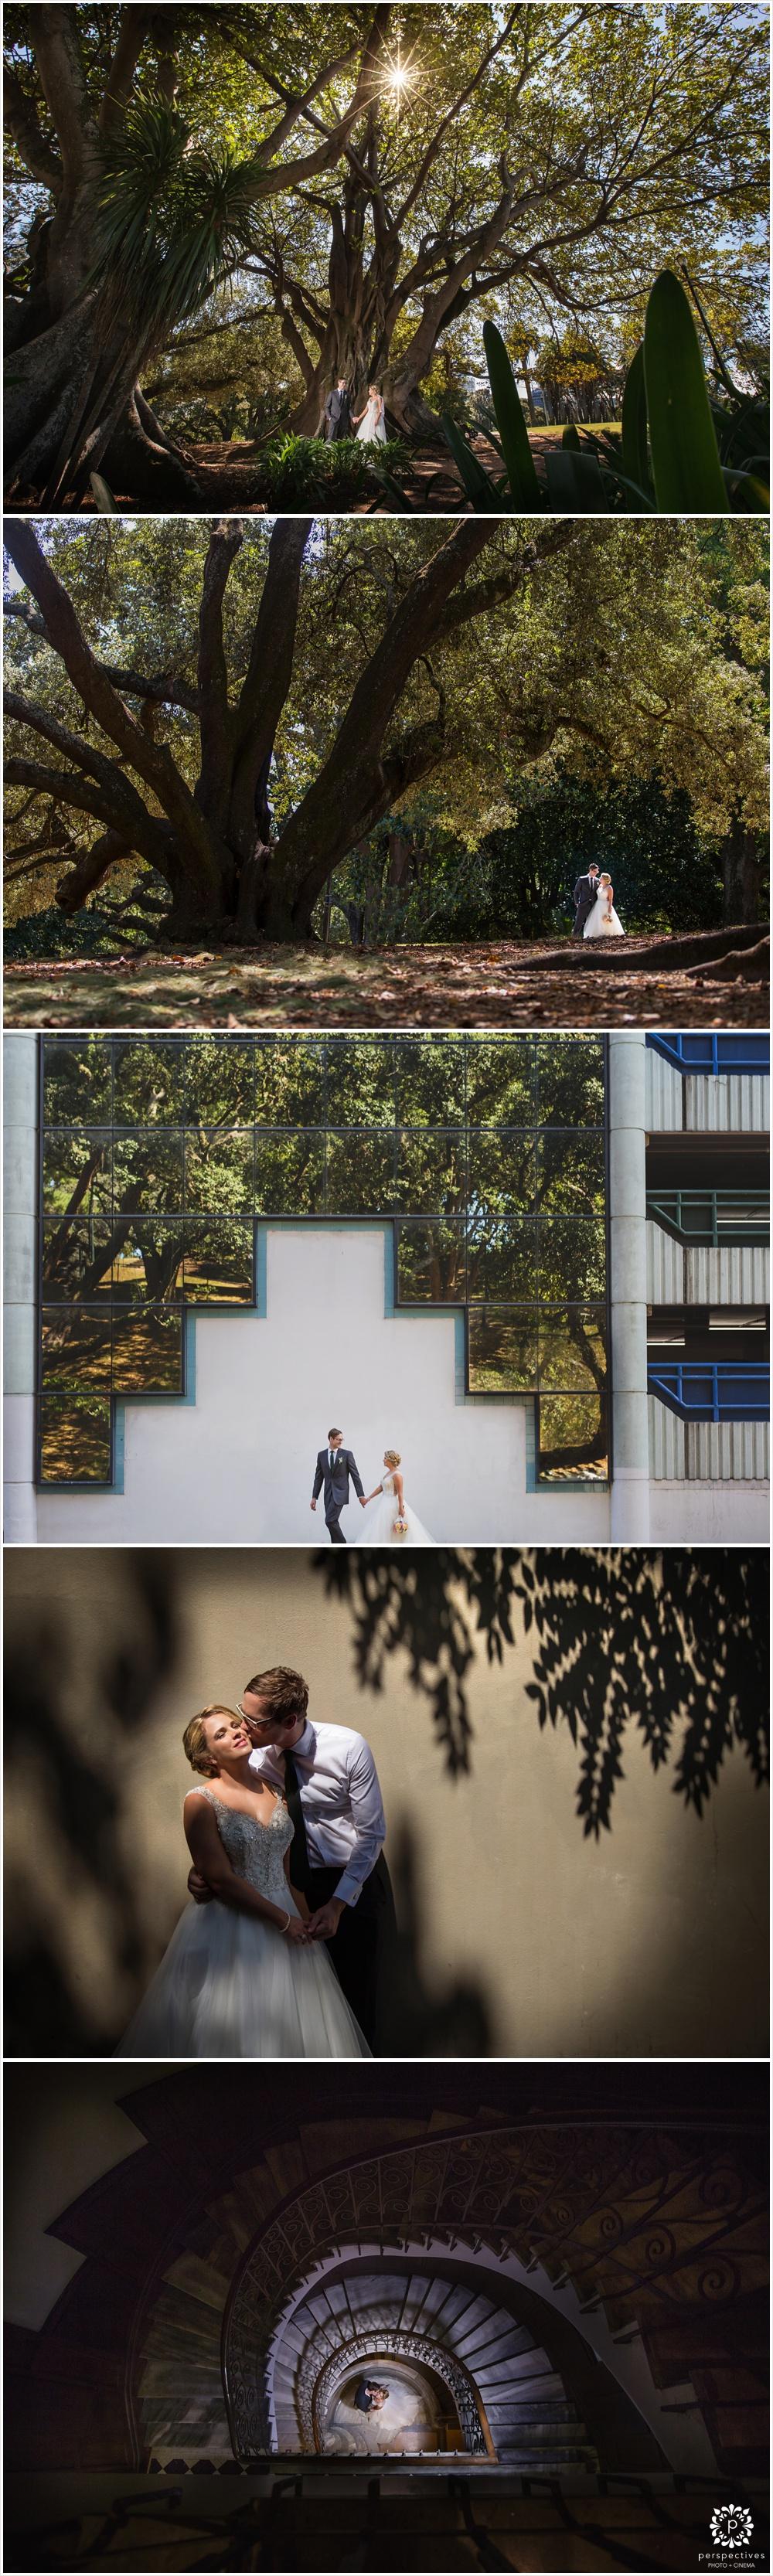 Urban wedding photos auckland